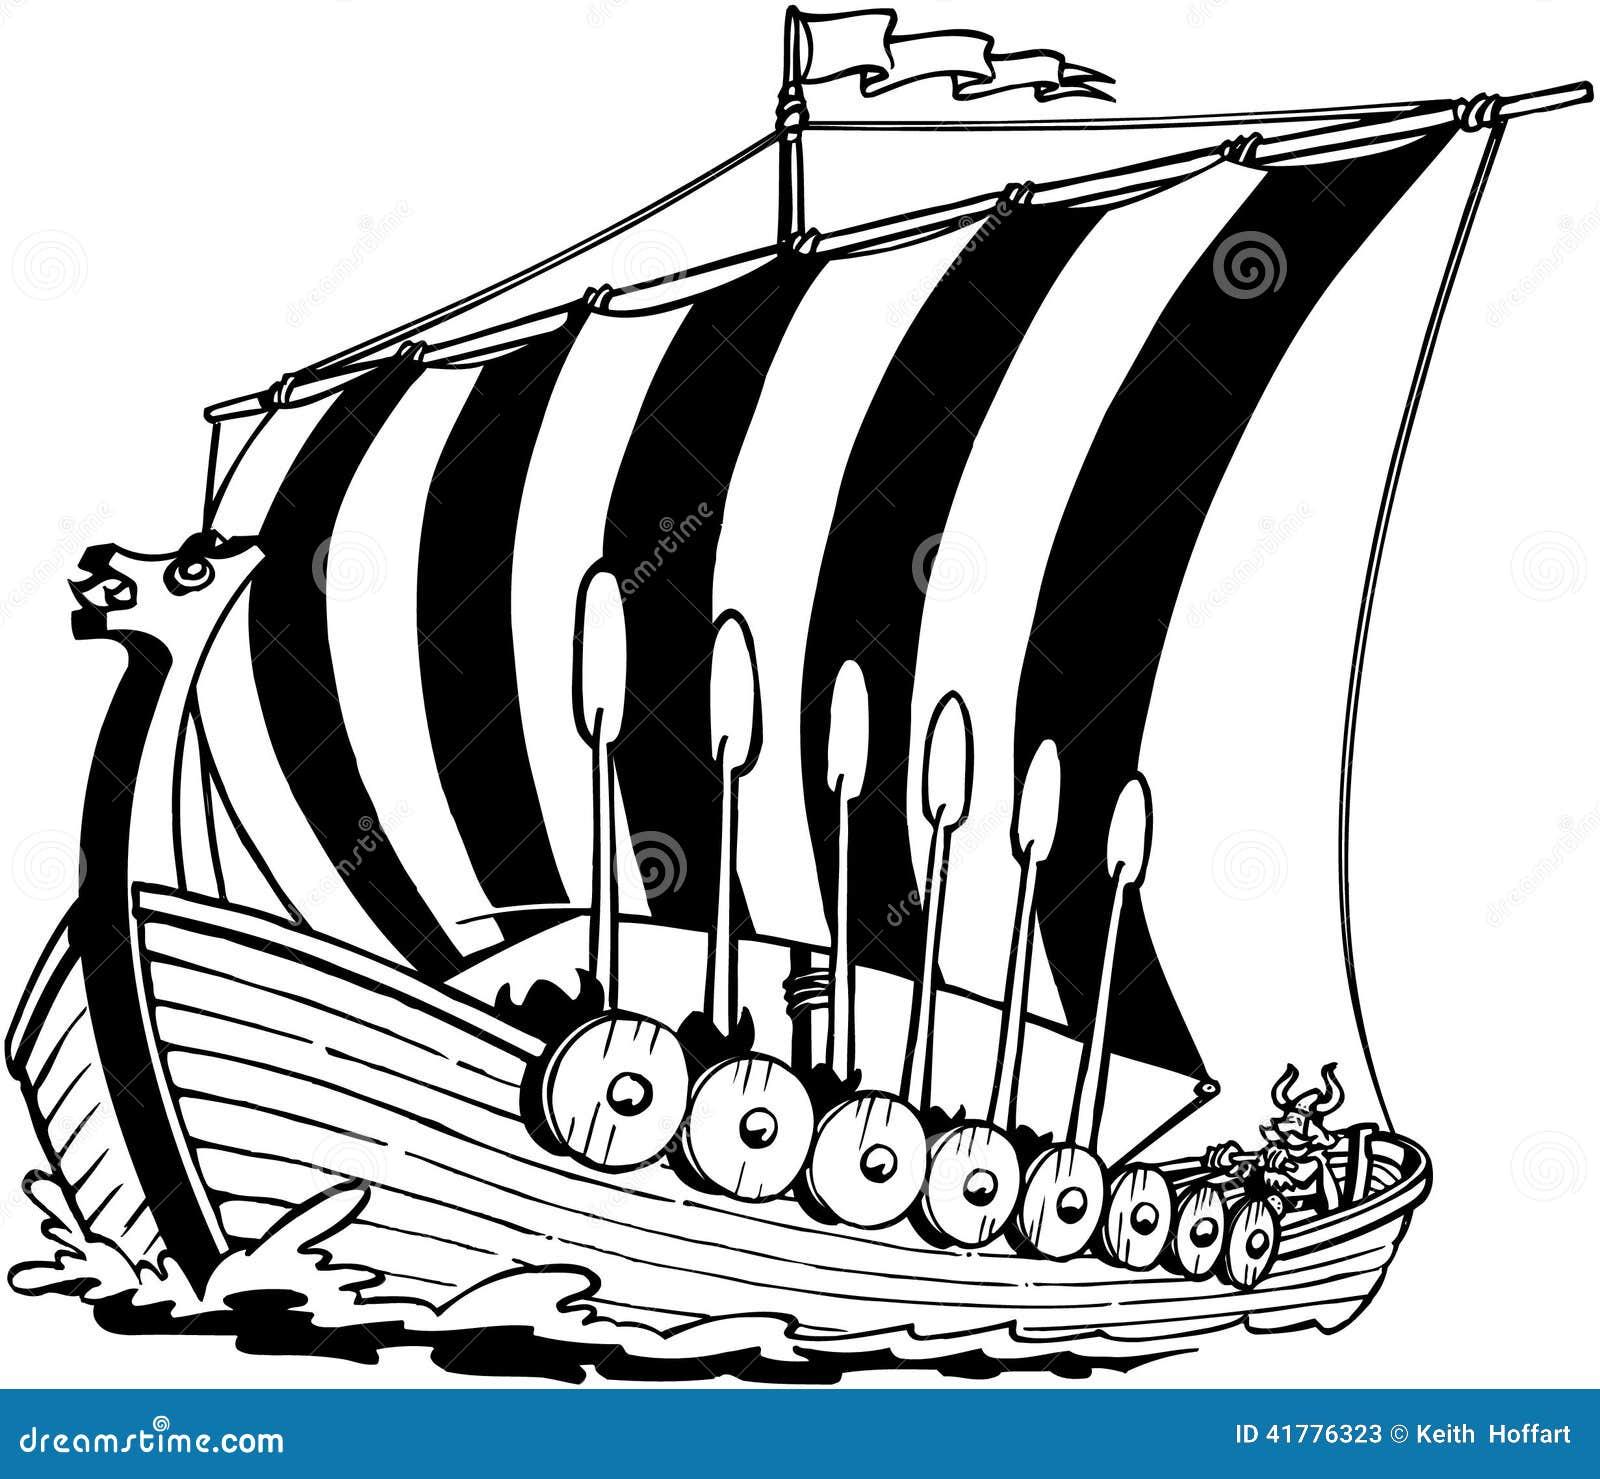 sailboat-clipart